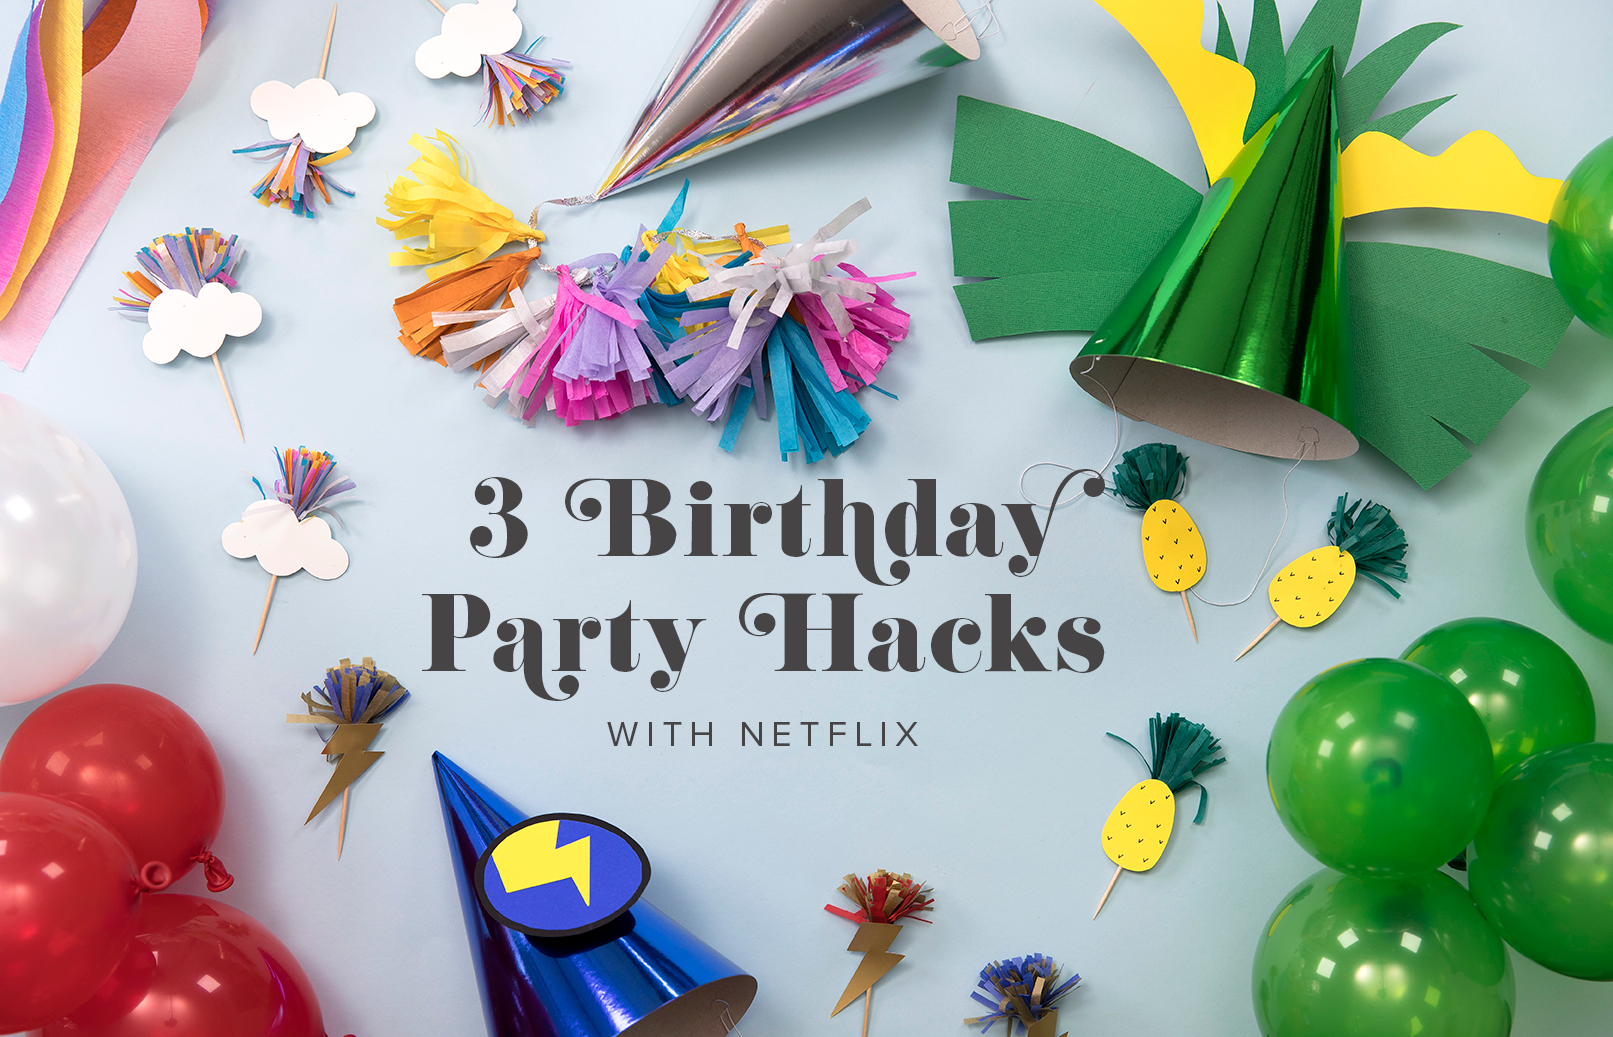 Birthday hacks with Netflix